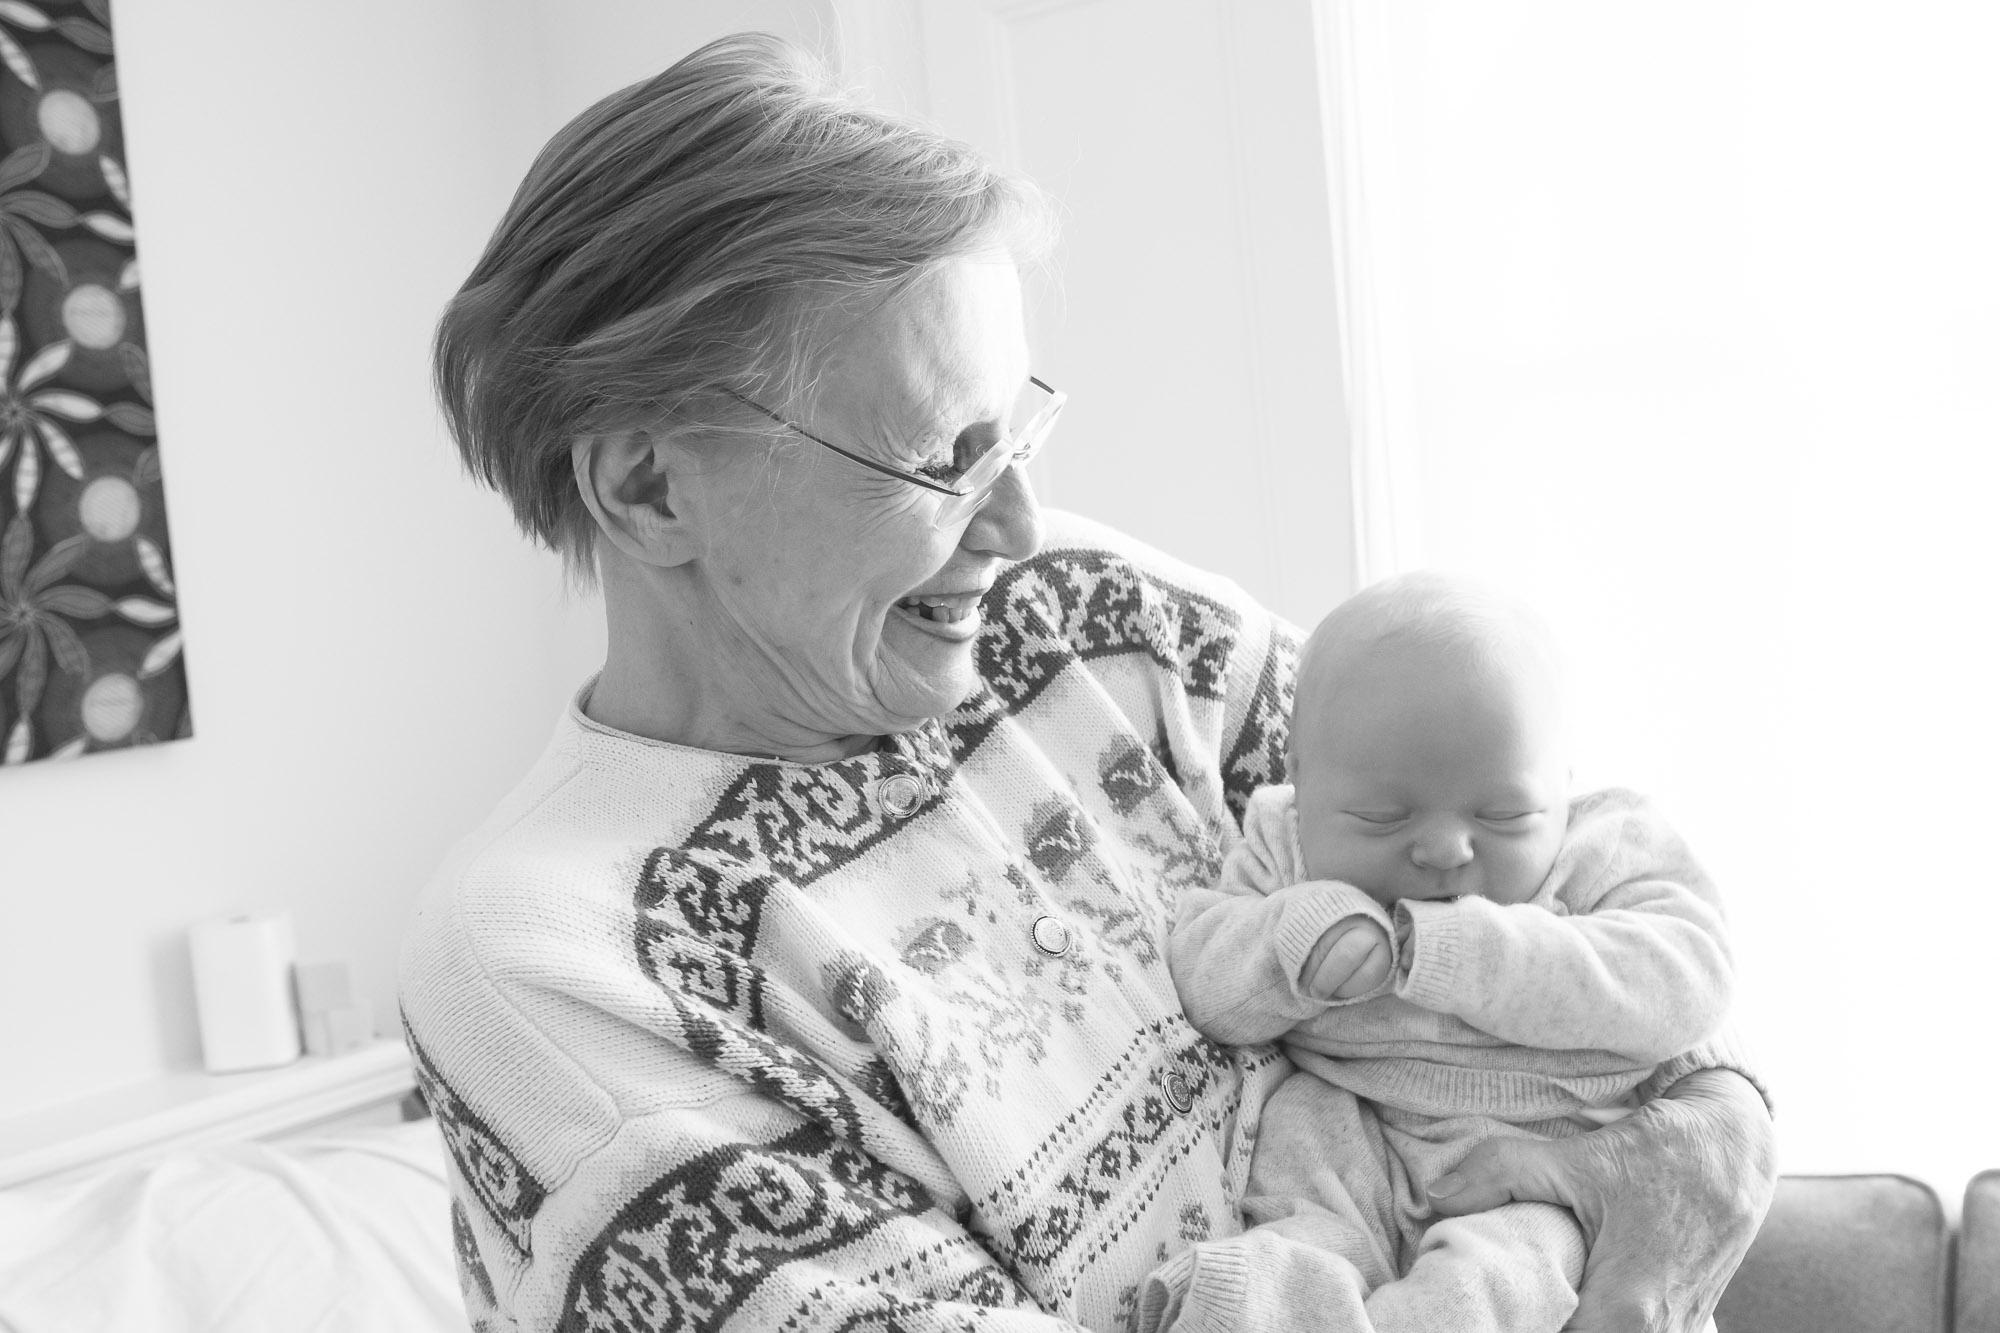 newborn-baby-family-portrait-photographer-106.jpg